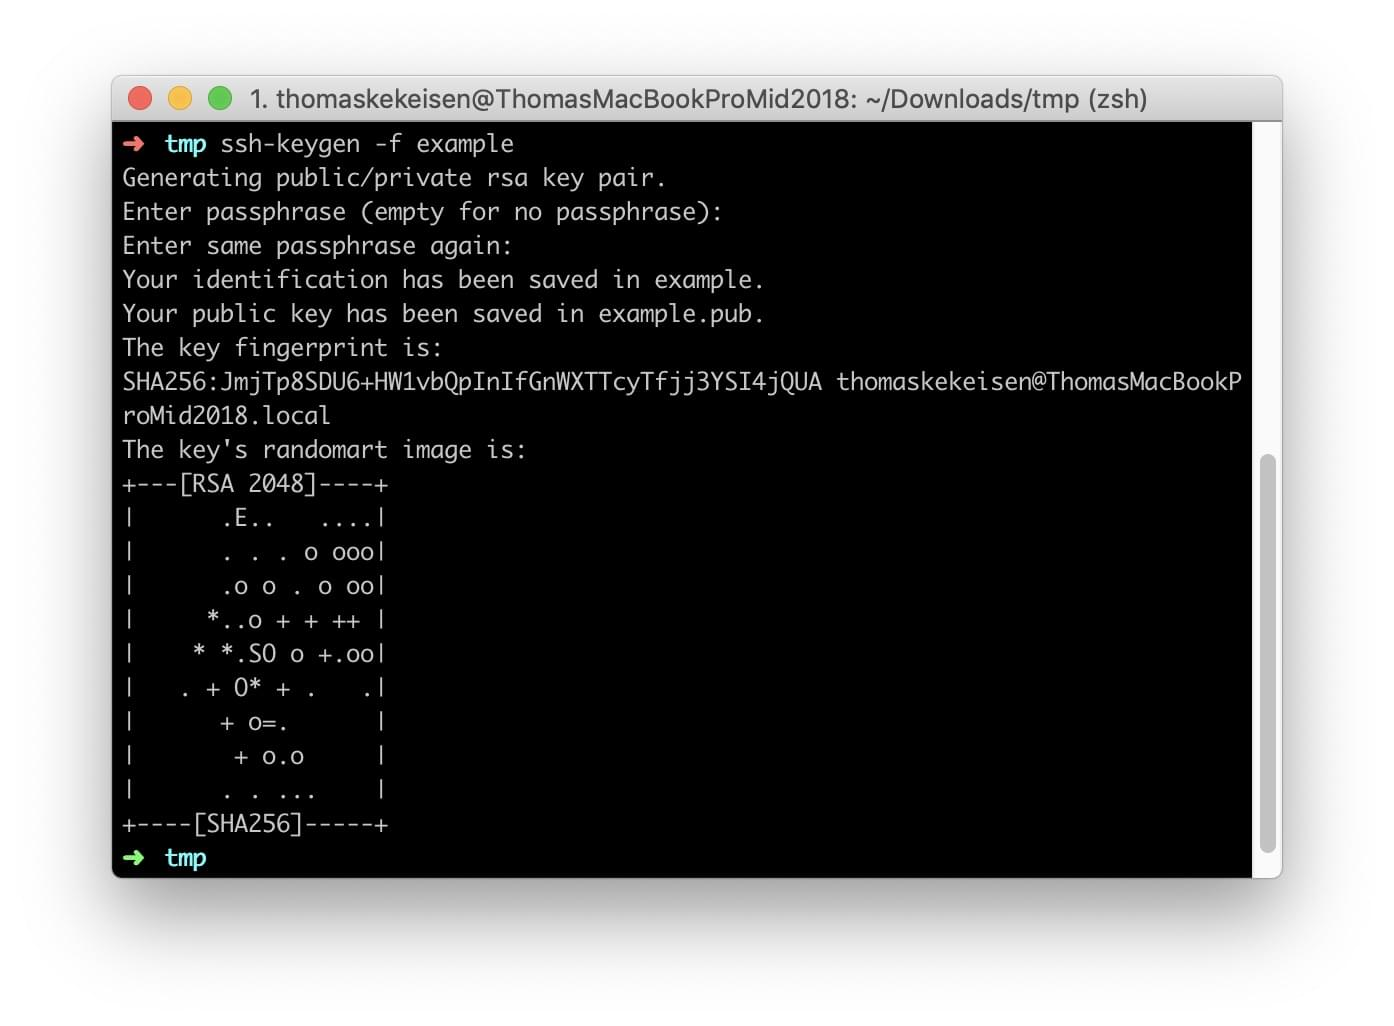 Synchronize git repository using Bitbucket pipelines - Thomas